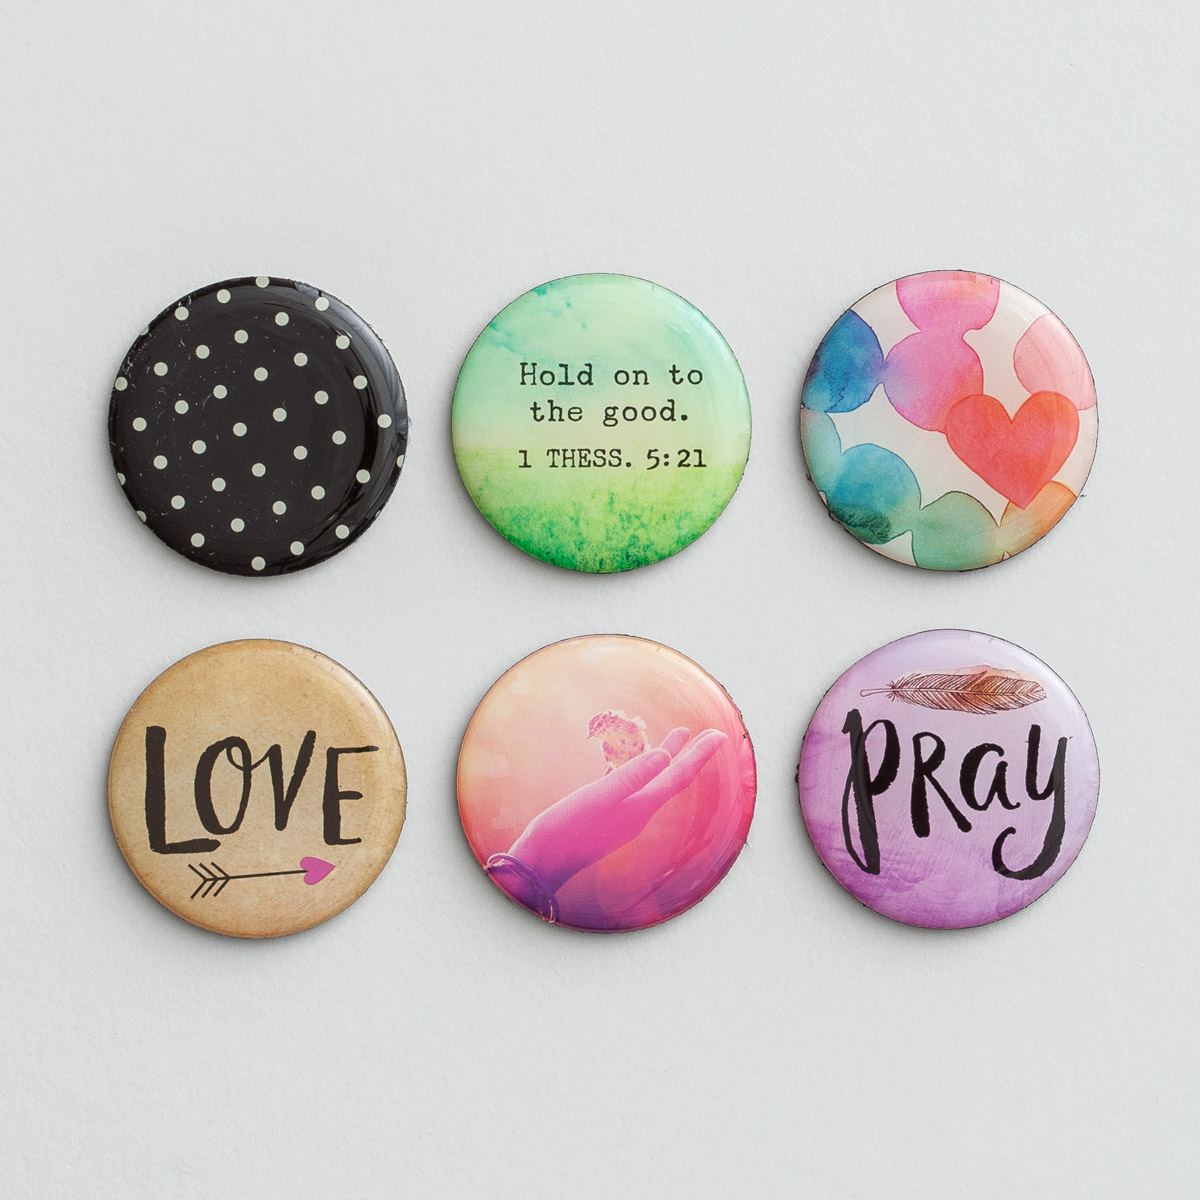 Sadie Robertson - Inspirational Magnets, Set of 6